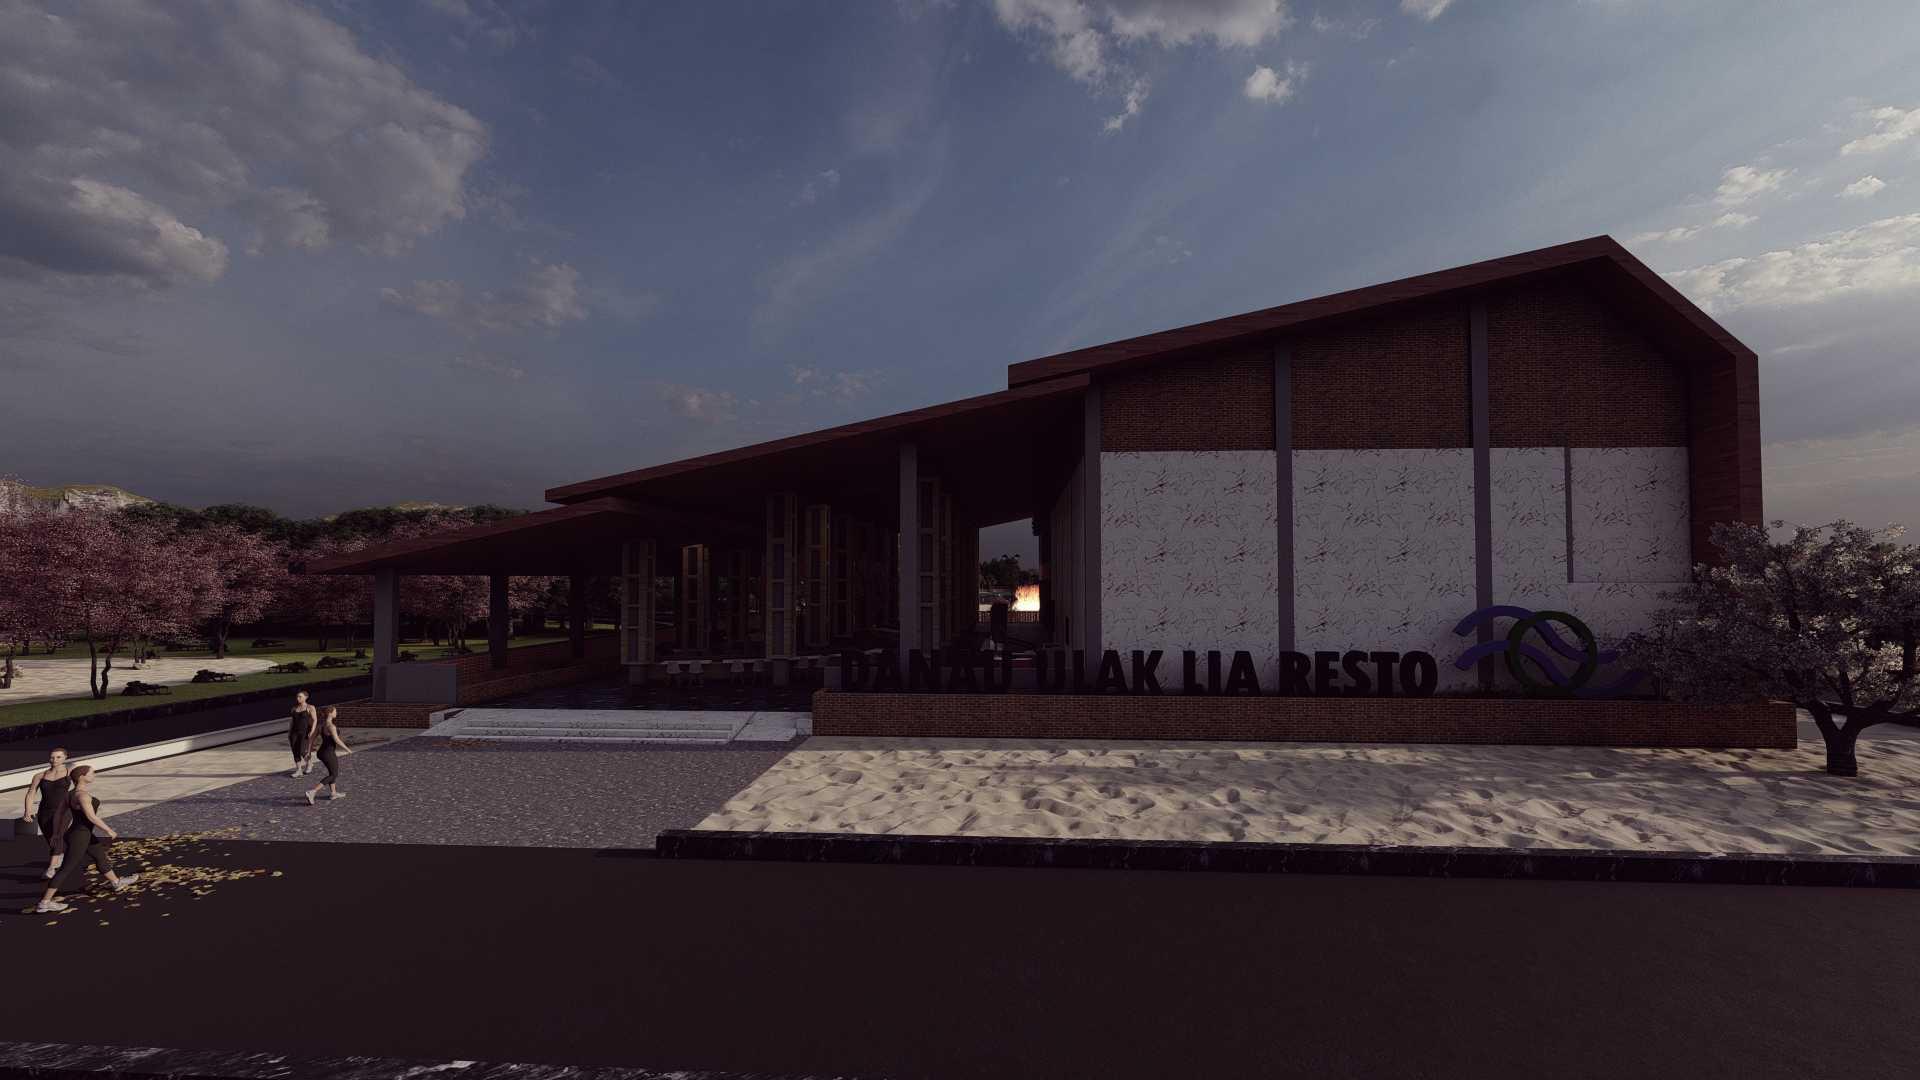 Pt.marpen Karya Perkasa Restaurant- Resto Ulak Lia Sekayu, Kabupaten Musi Banyuasin, Sumatera Selatan, Indonesia Sekayu, Kabupaten Musi Banyuasin, Sumatera Selatan, Indonesia Ptmarpen-Karya-Perkasa-Restaurant-Resto-Ulak-Lia   111490